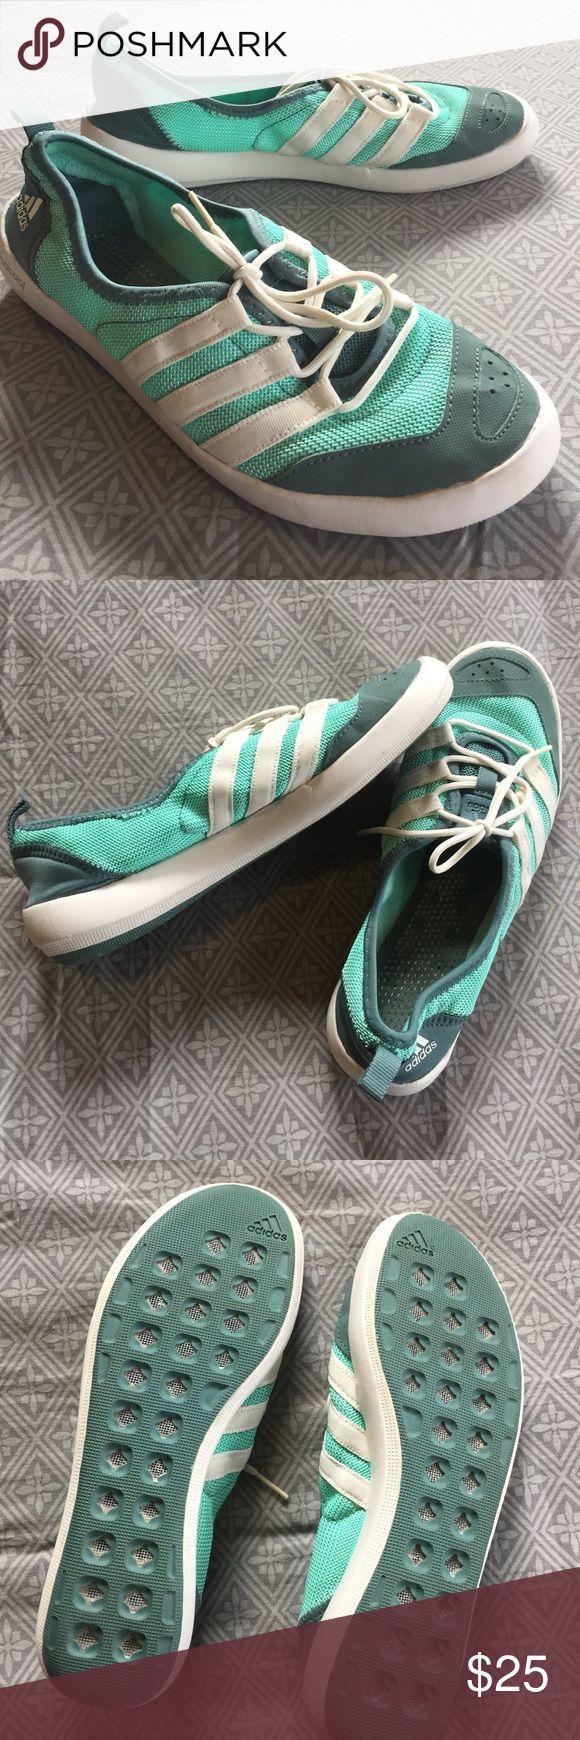 Adidas Women's Climacool Boat Sleek Water Shoe